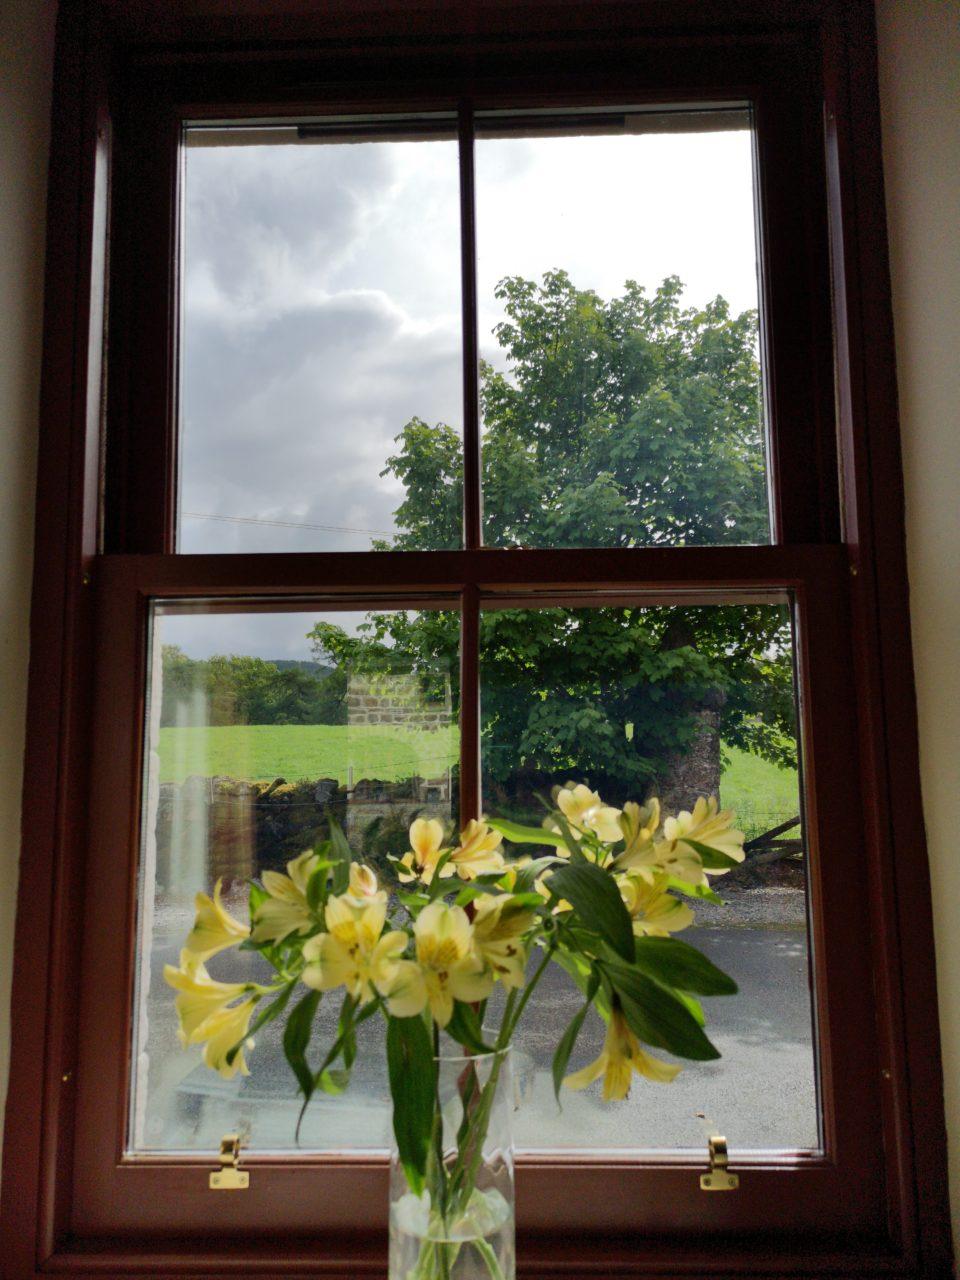 Yellow flowers in glass vase on windowsill